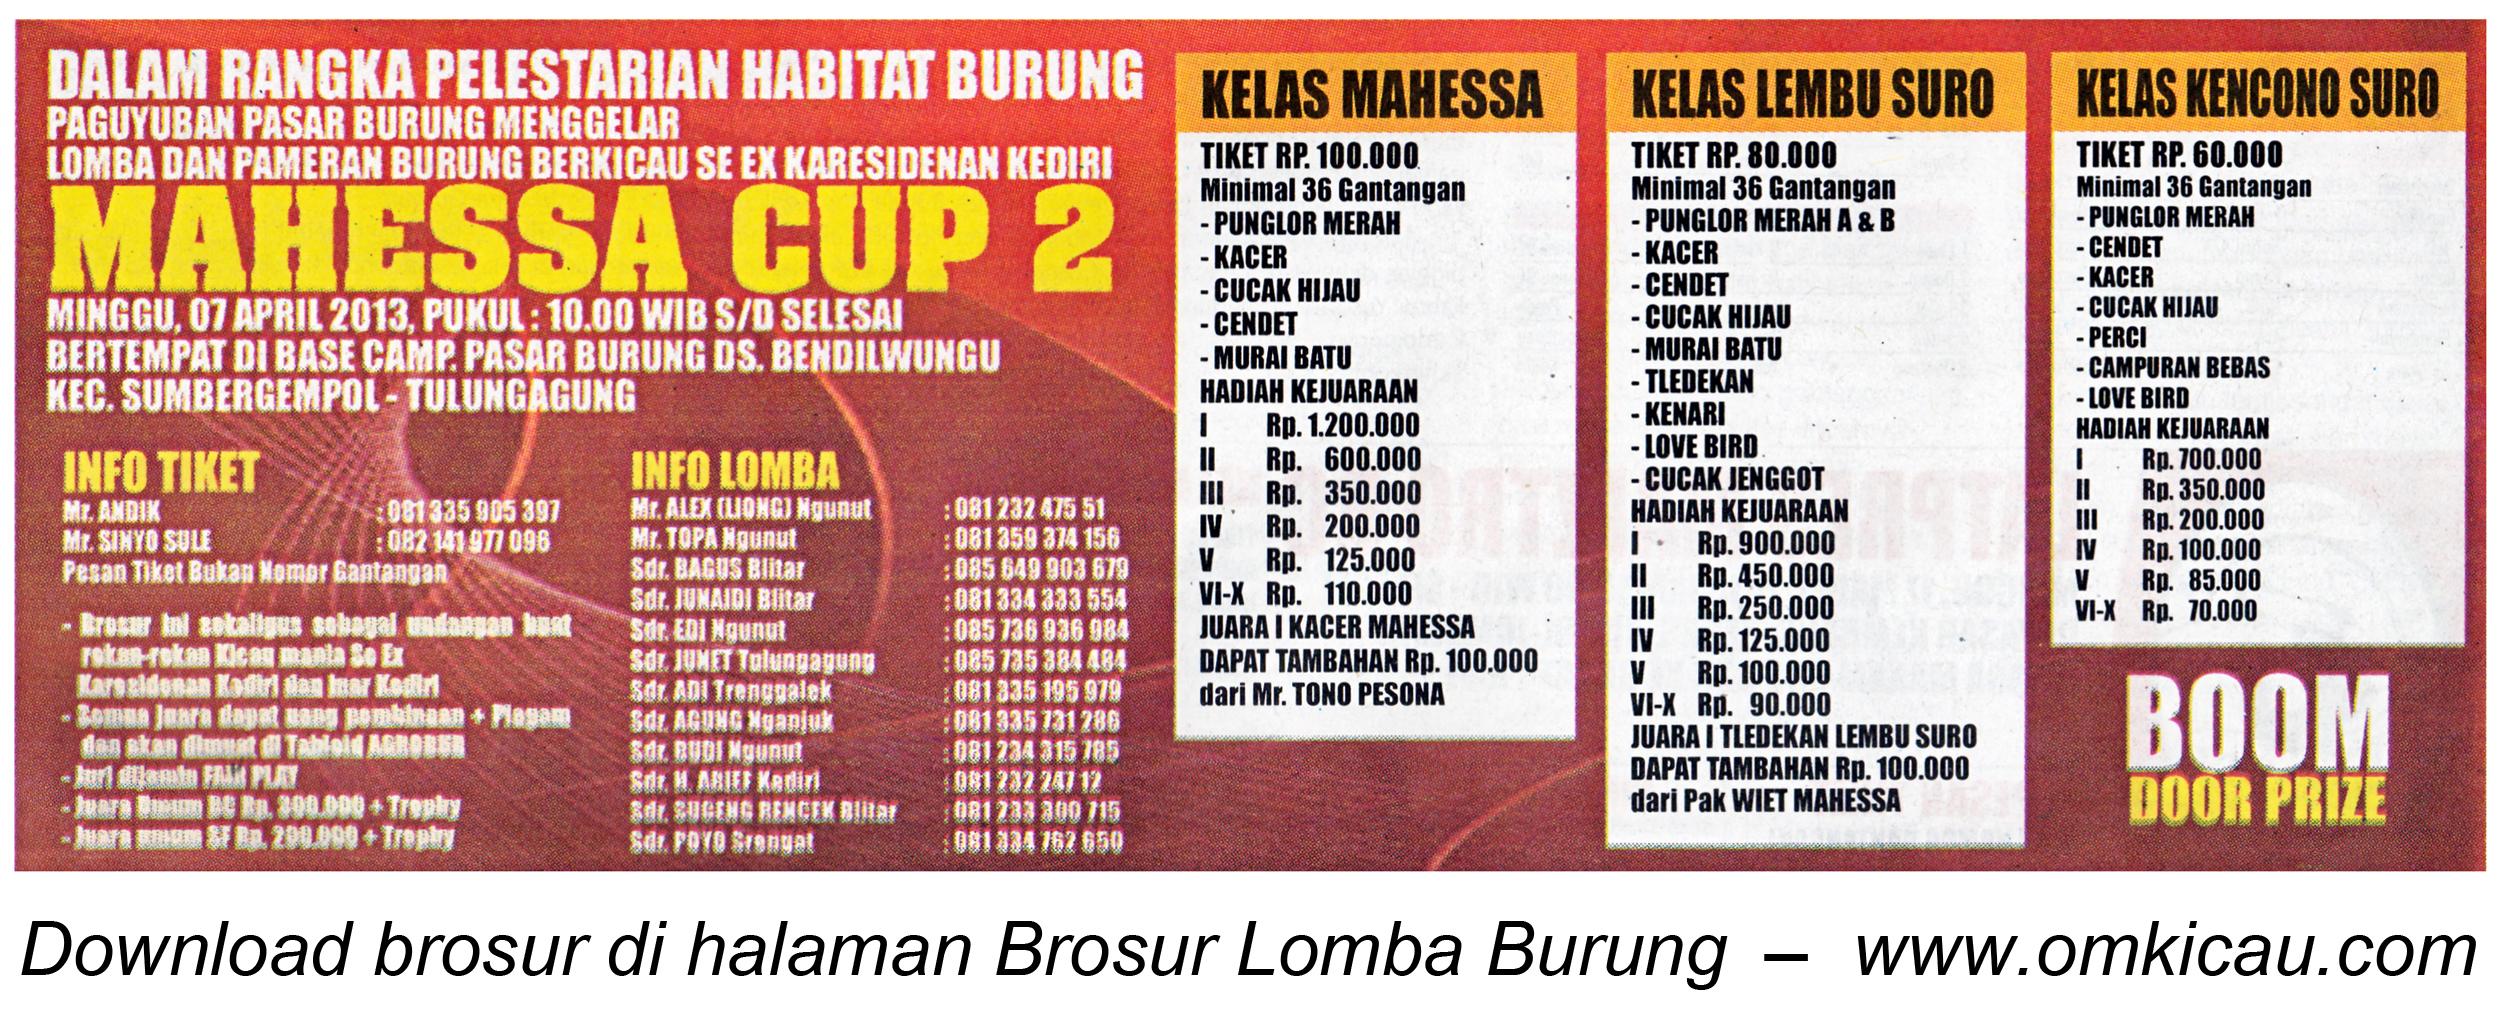 Brosur Lomba Mahessa Cup 2